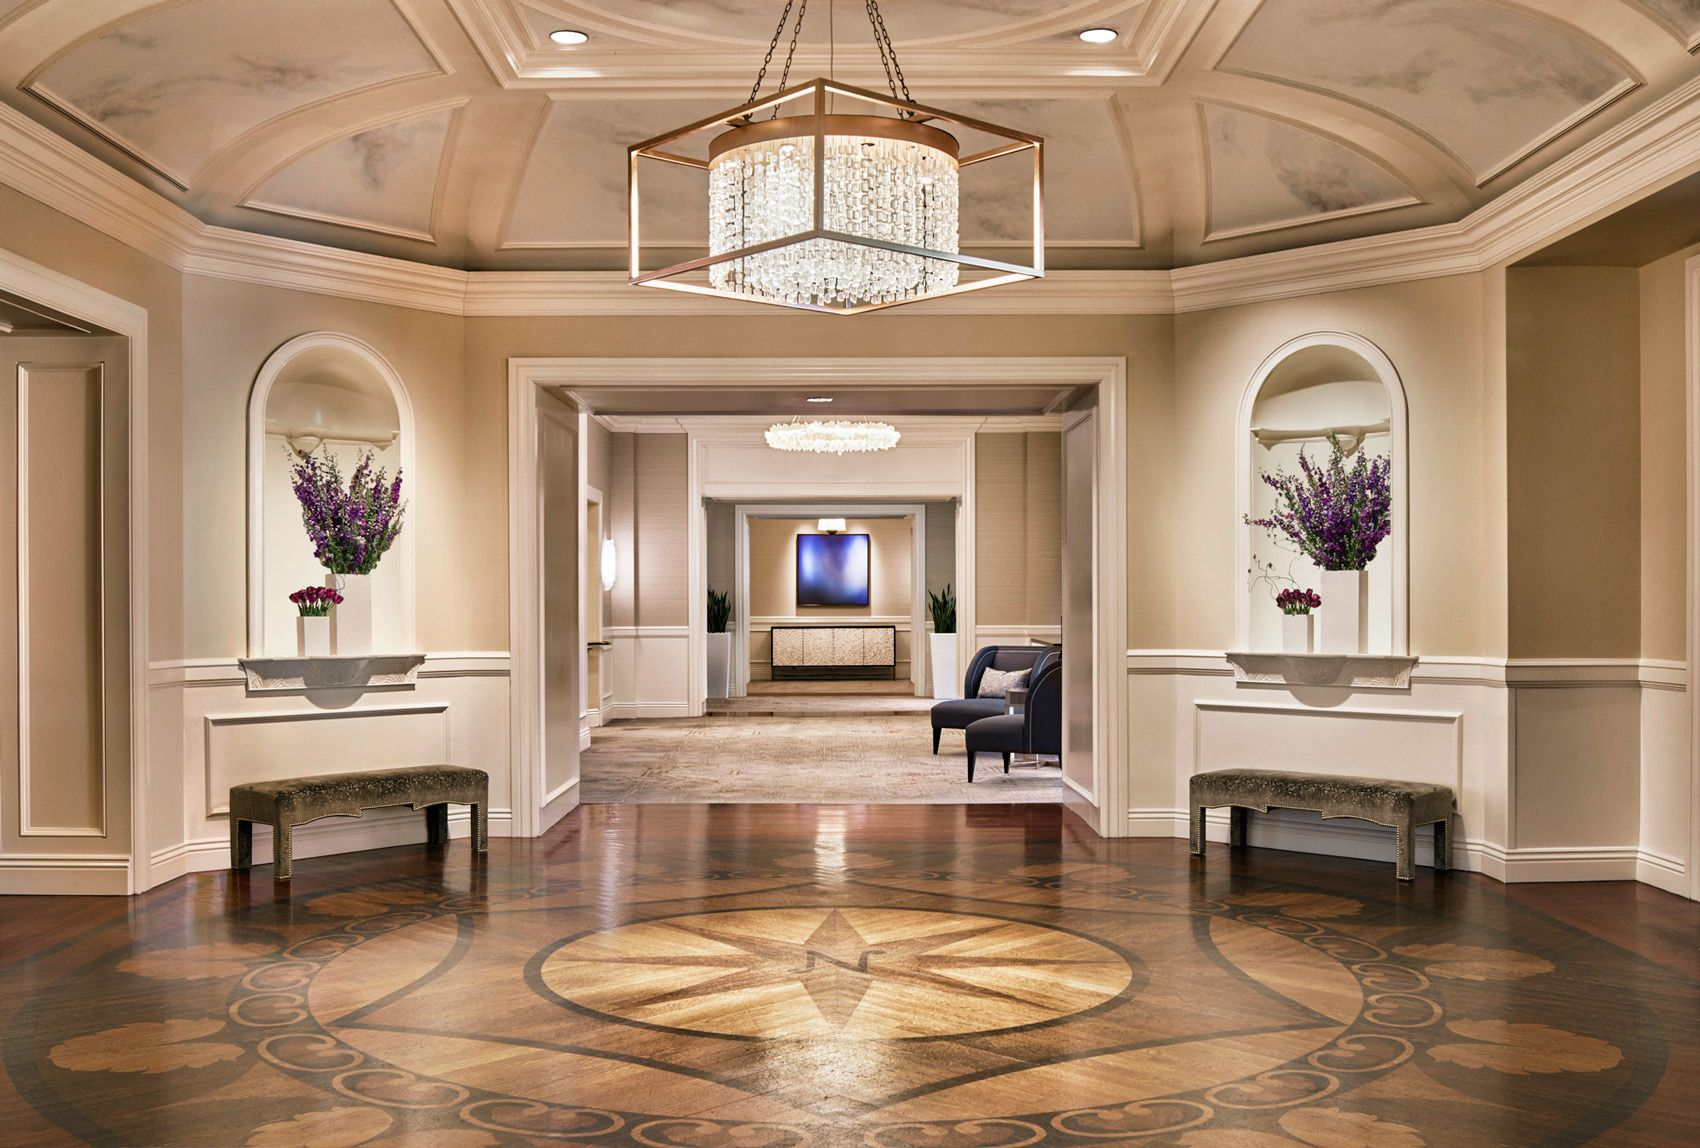 Ritz-Carlton Half Moon Bay Lobby